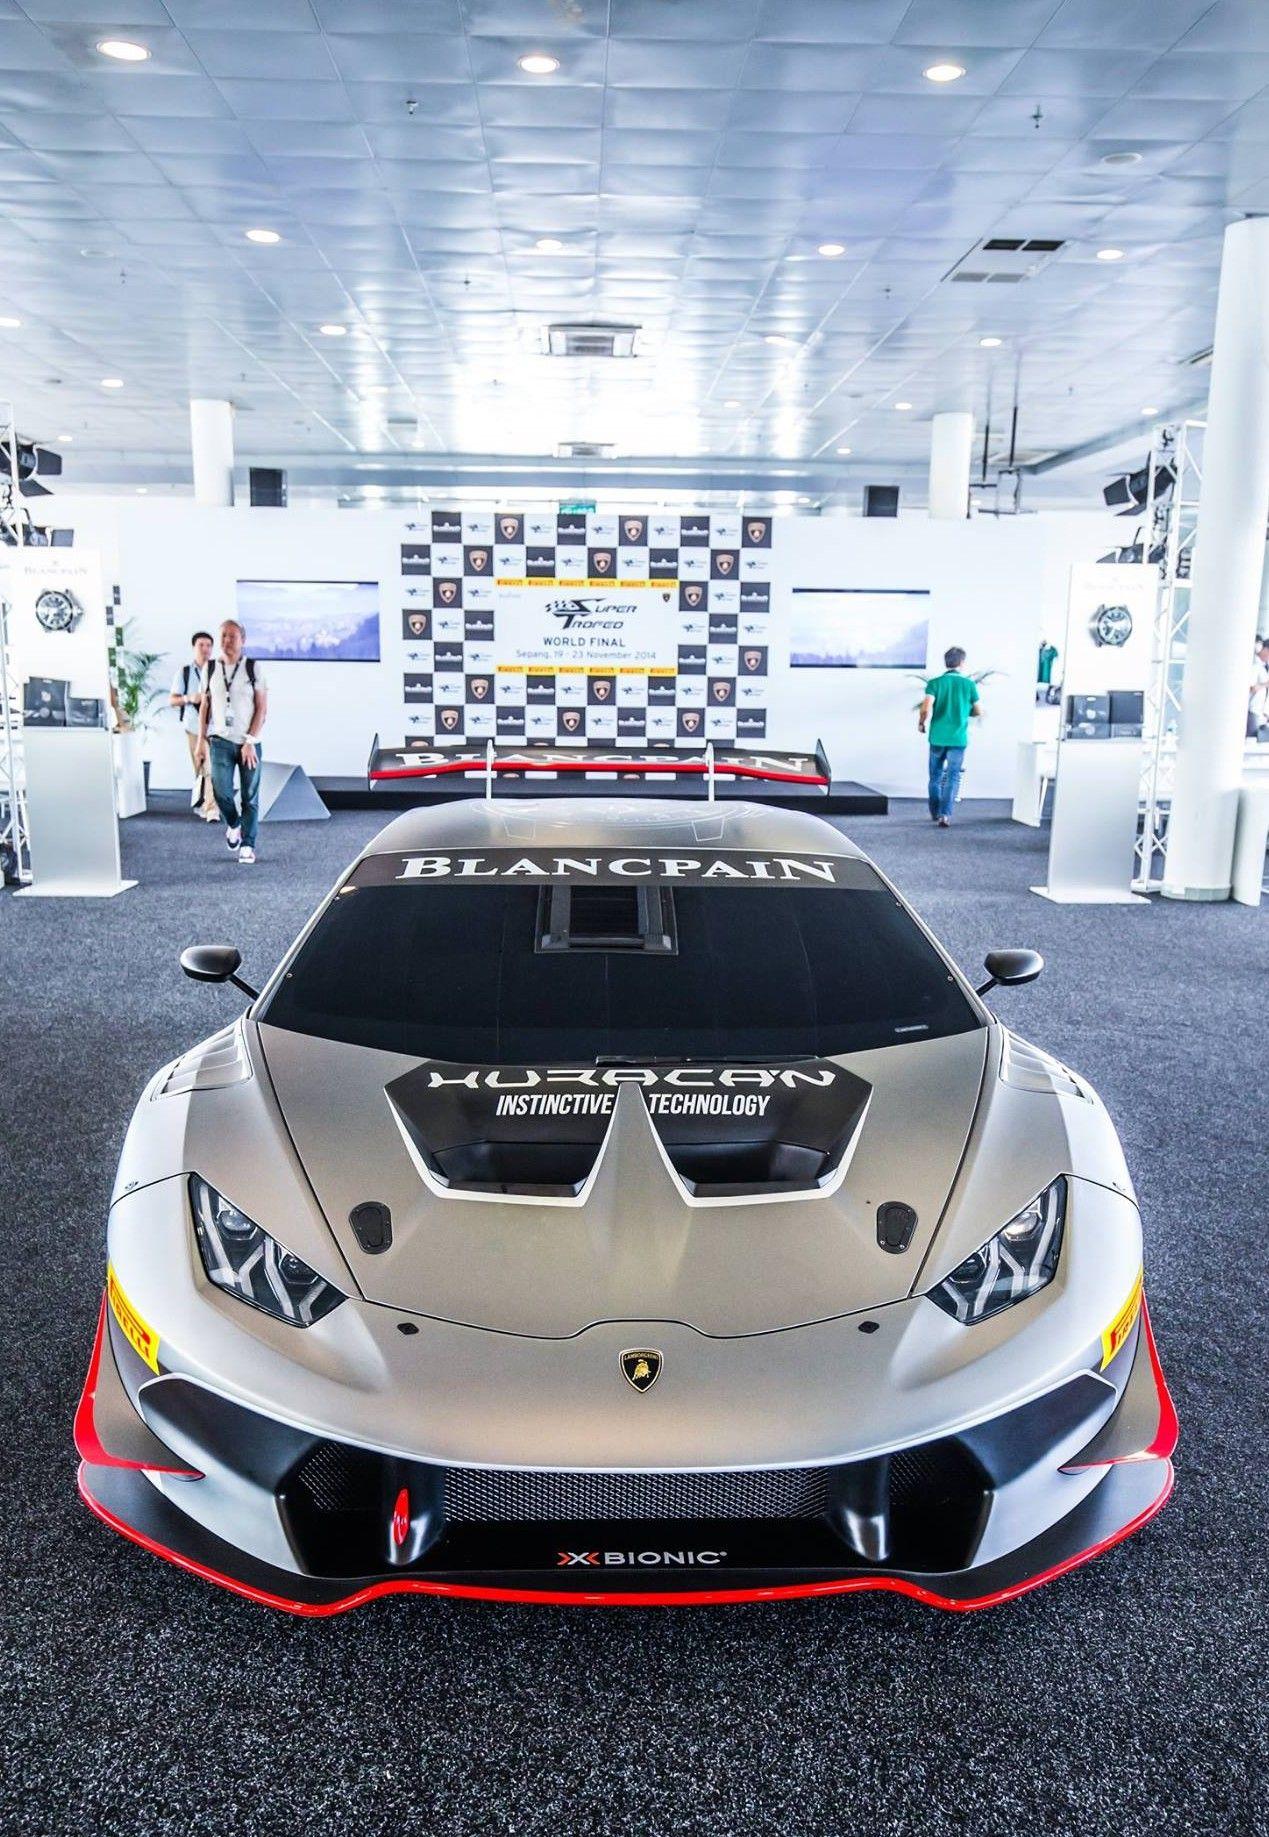 Lamborghini Huracan Super Troffeo Blancpain Link B F